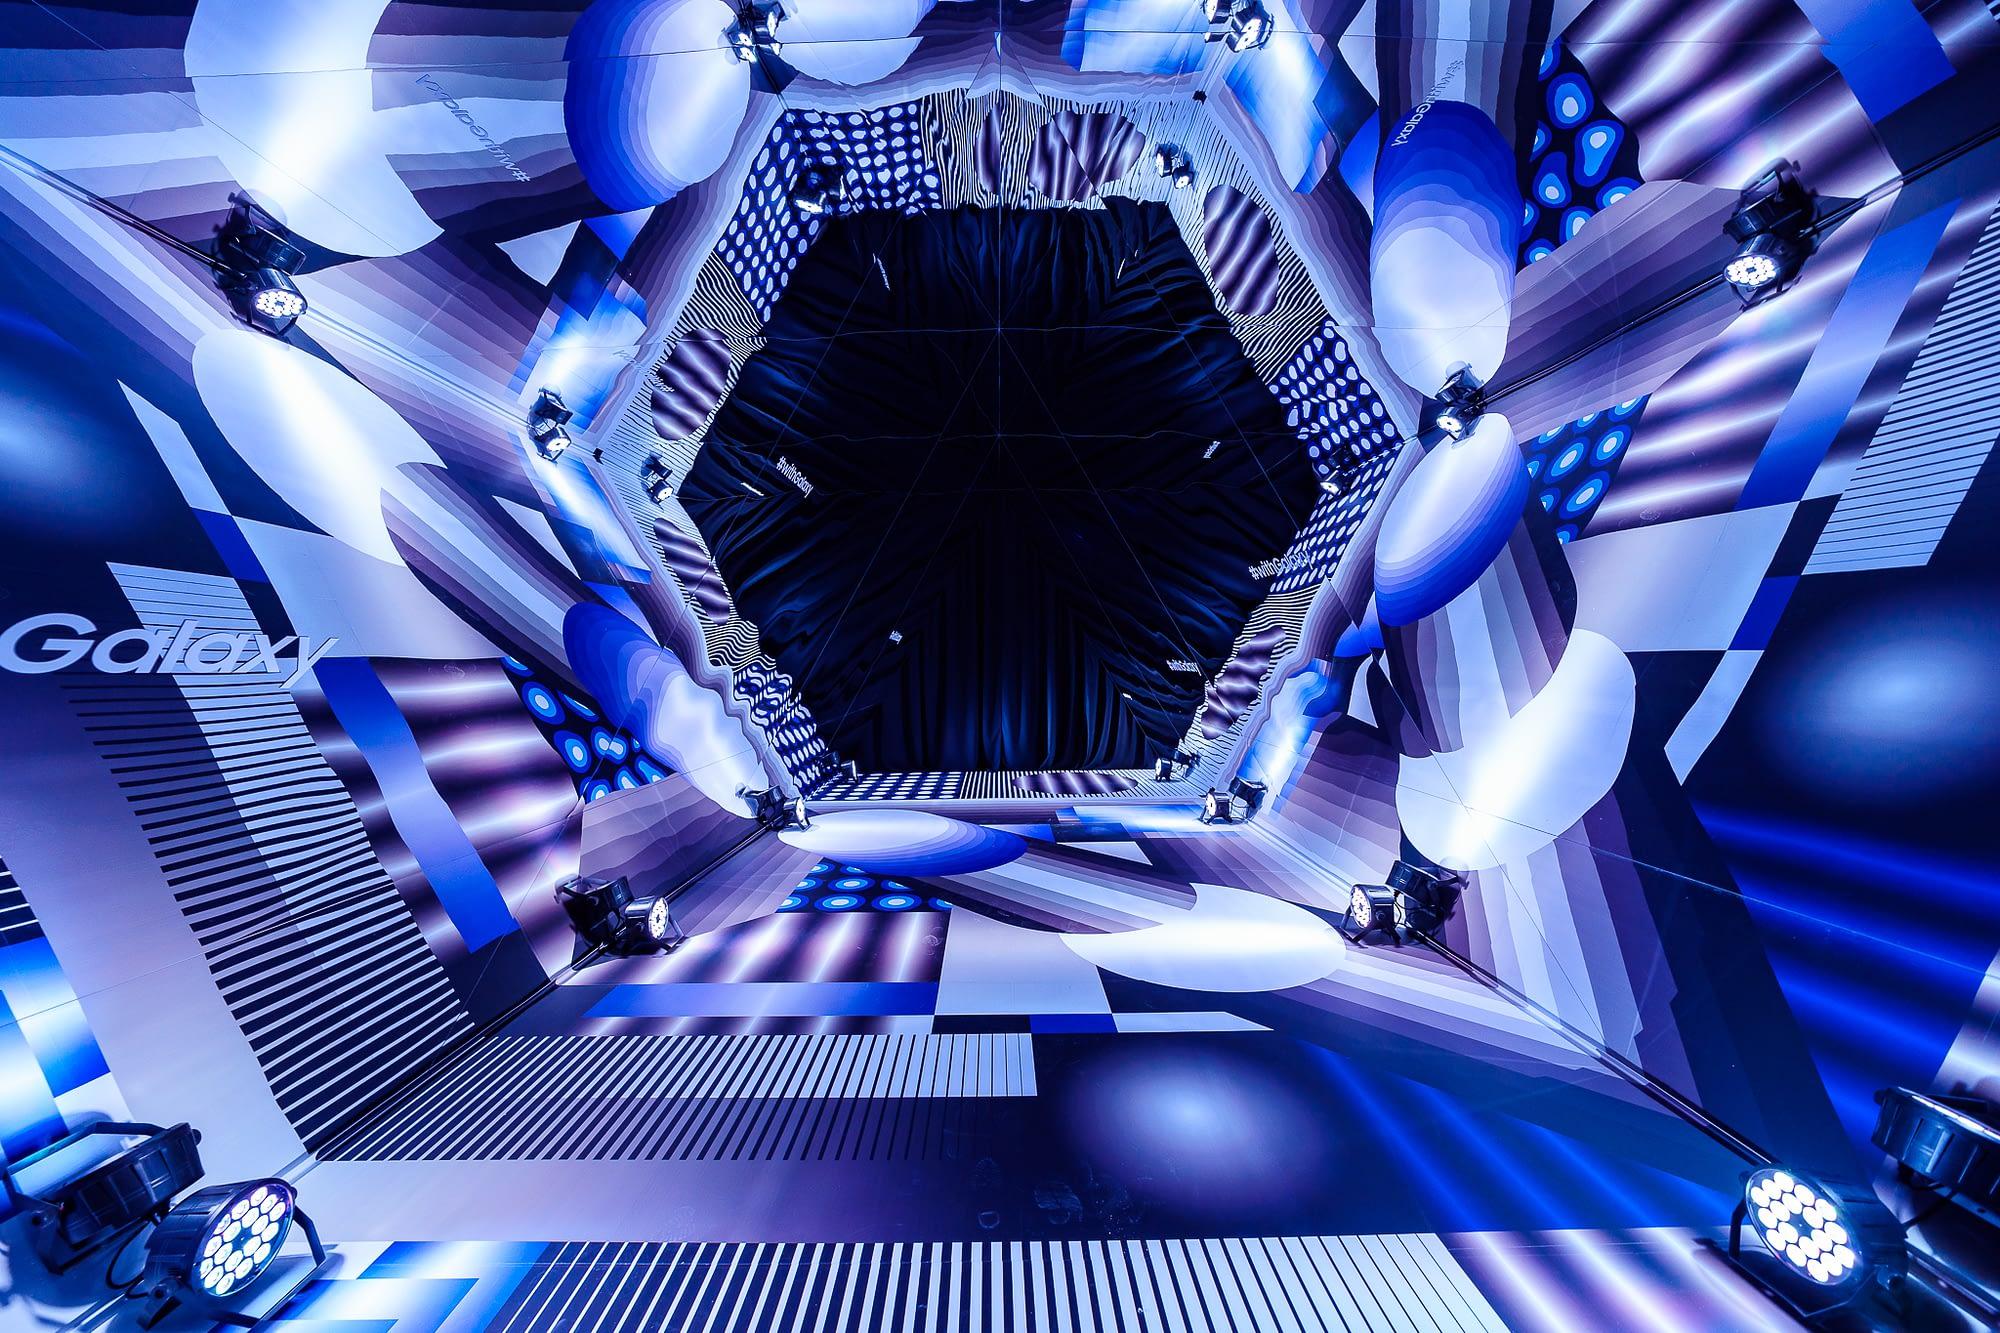 kaleidoscope lost optics samsung one night gallery